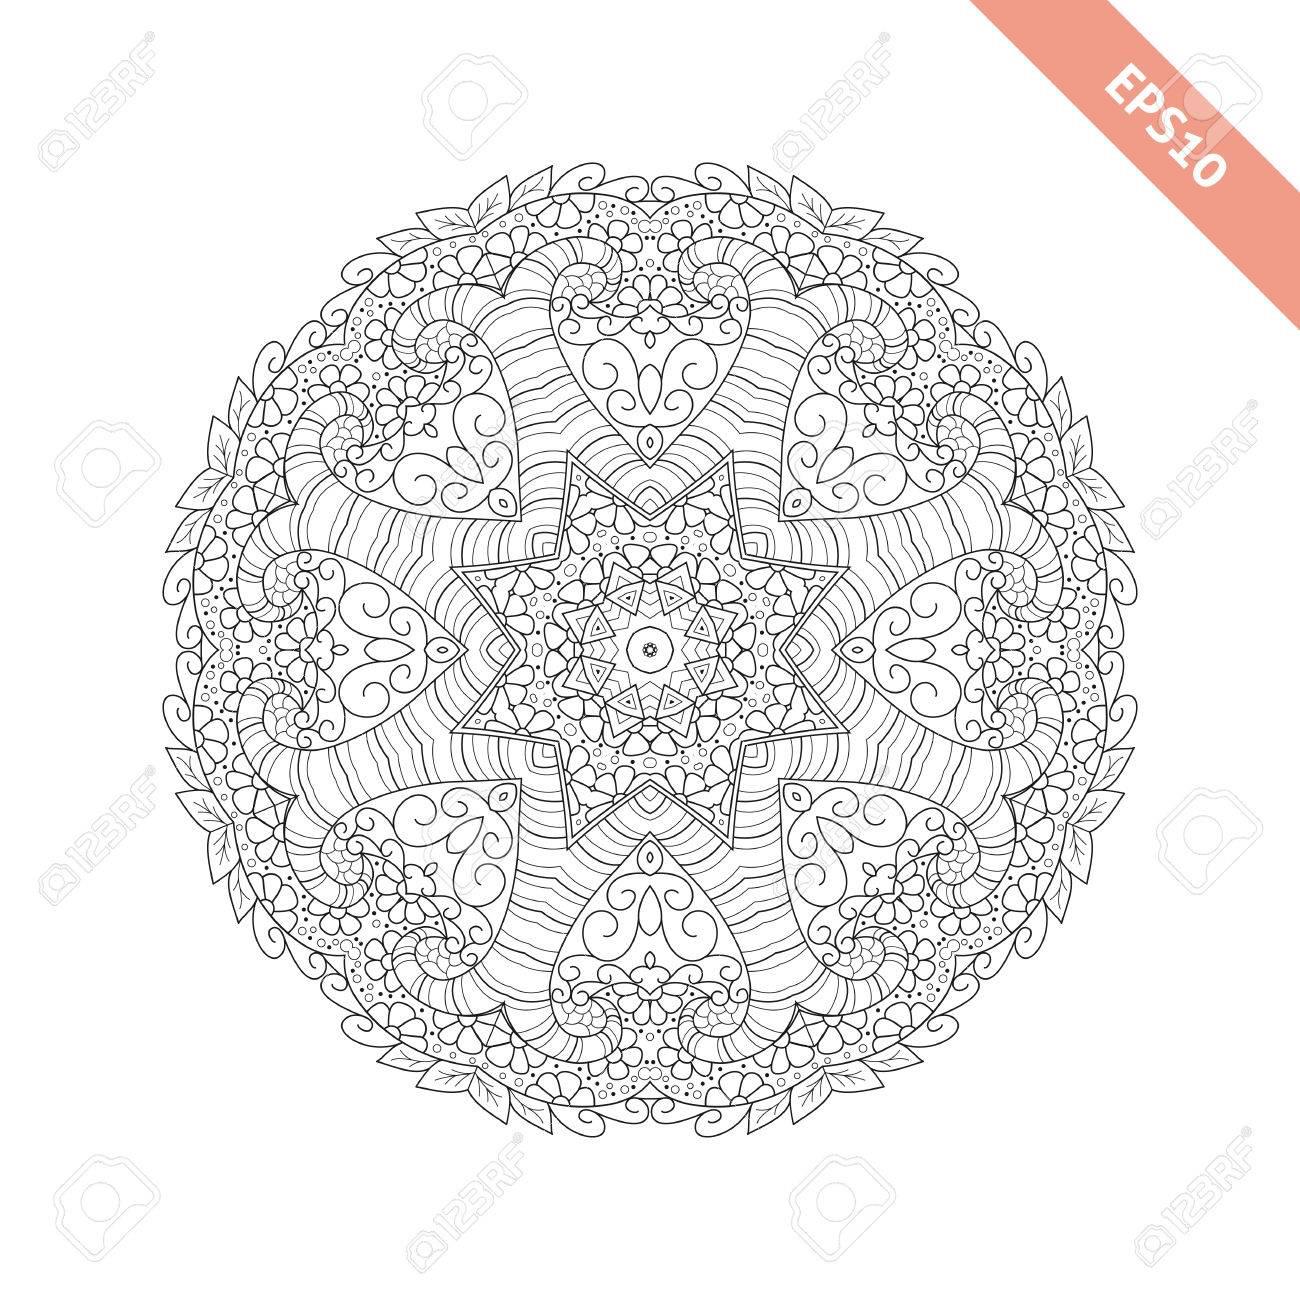 Ornamento Redondo Abstracto. Mandala. Fondo, Cubierta. Diseño De ...